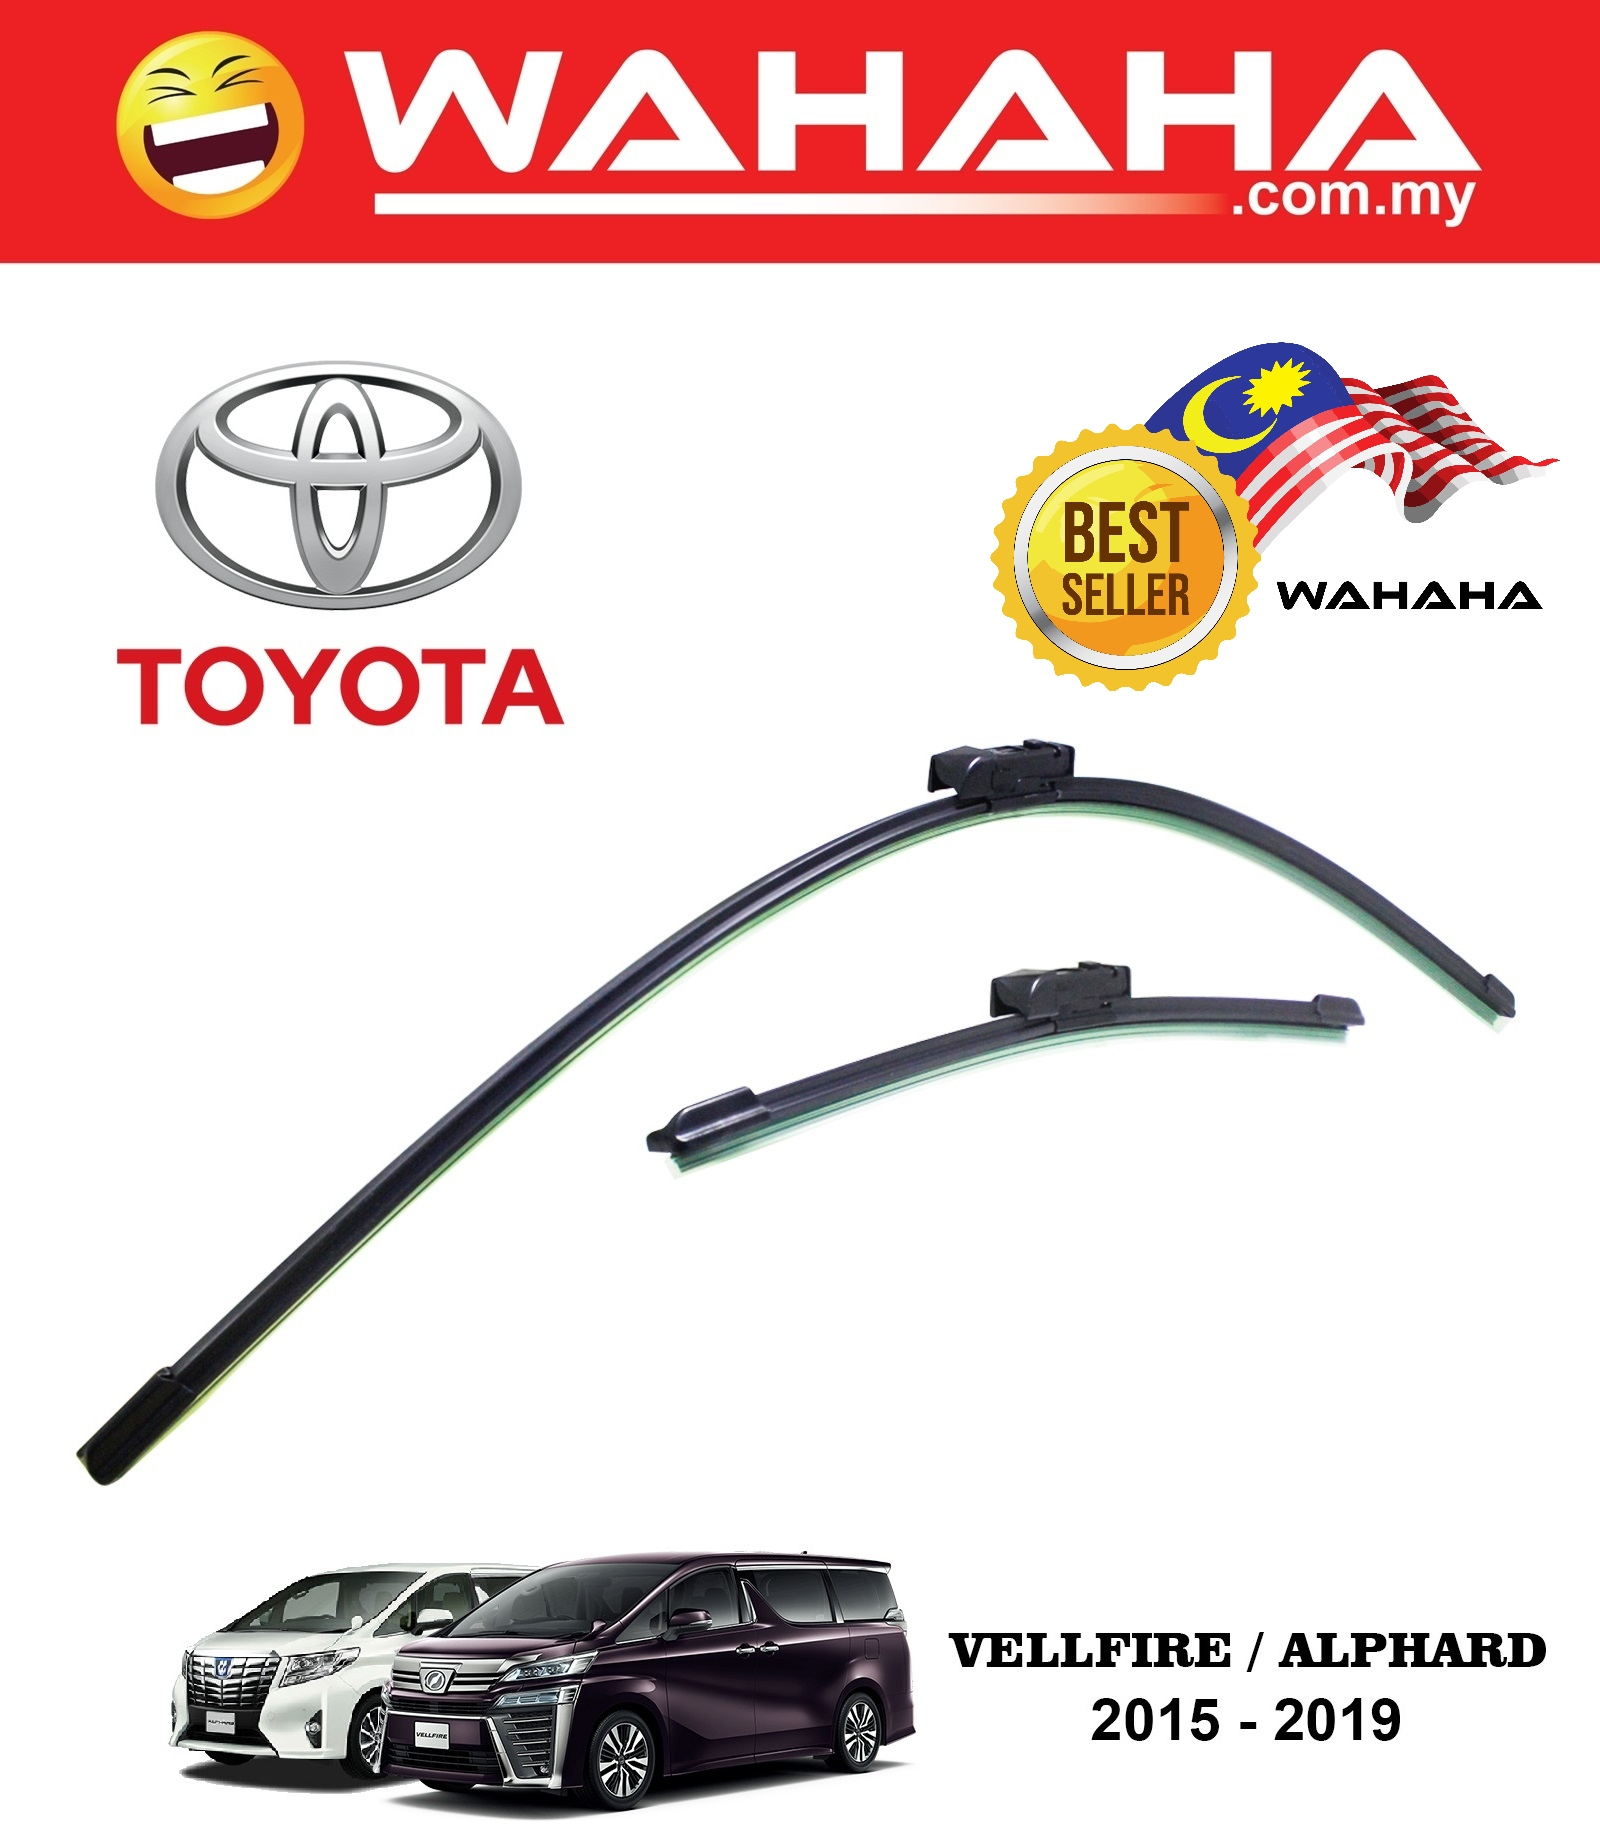 Toyota Vellfire Alphard 2015 - 2019 30